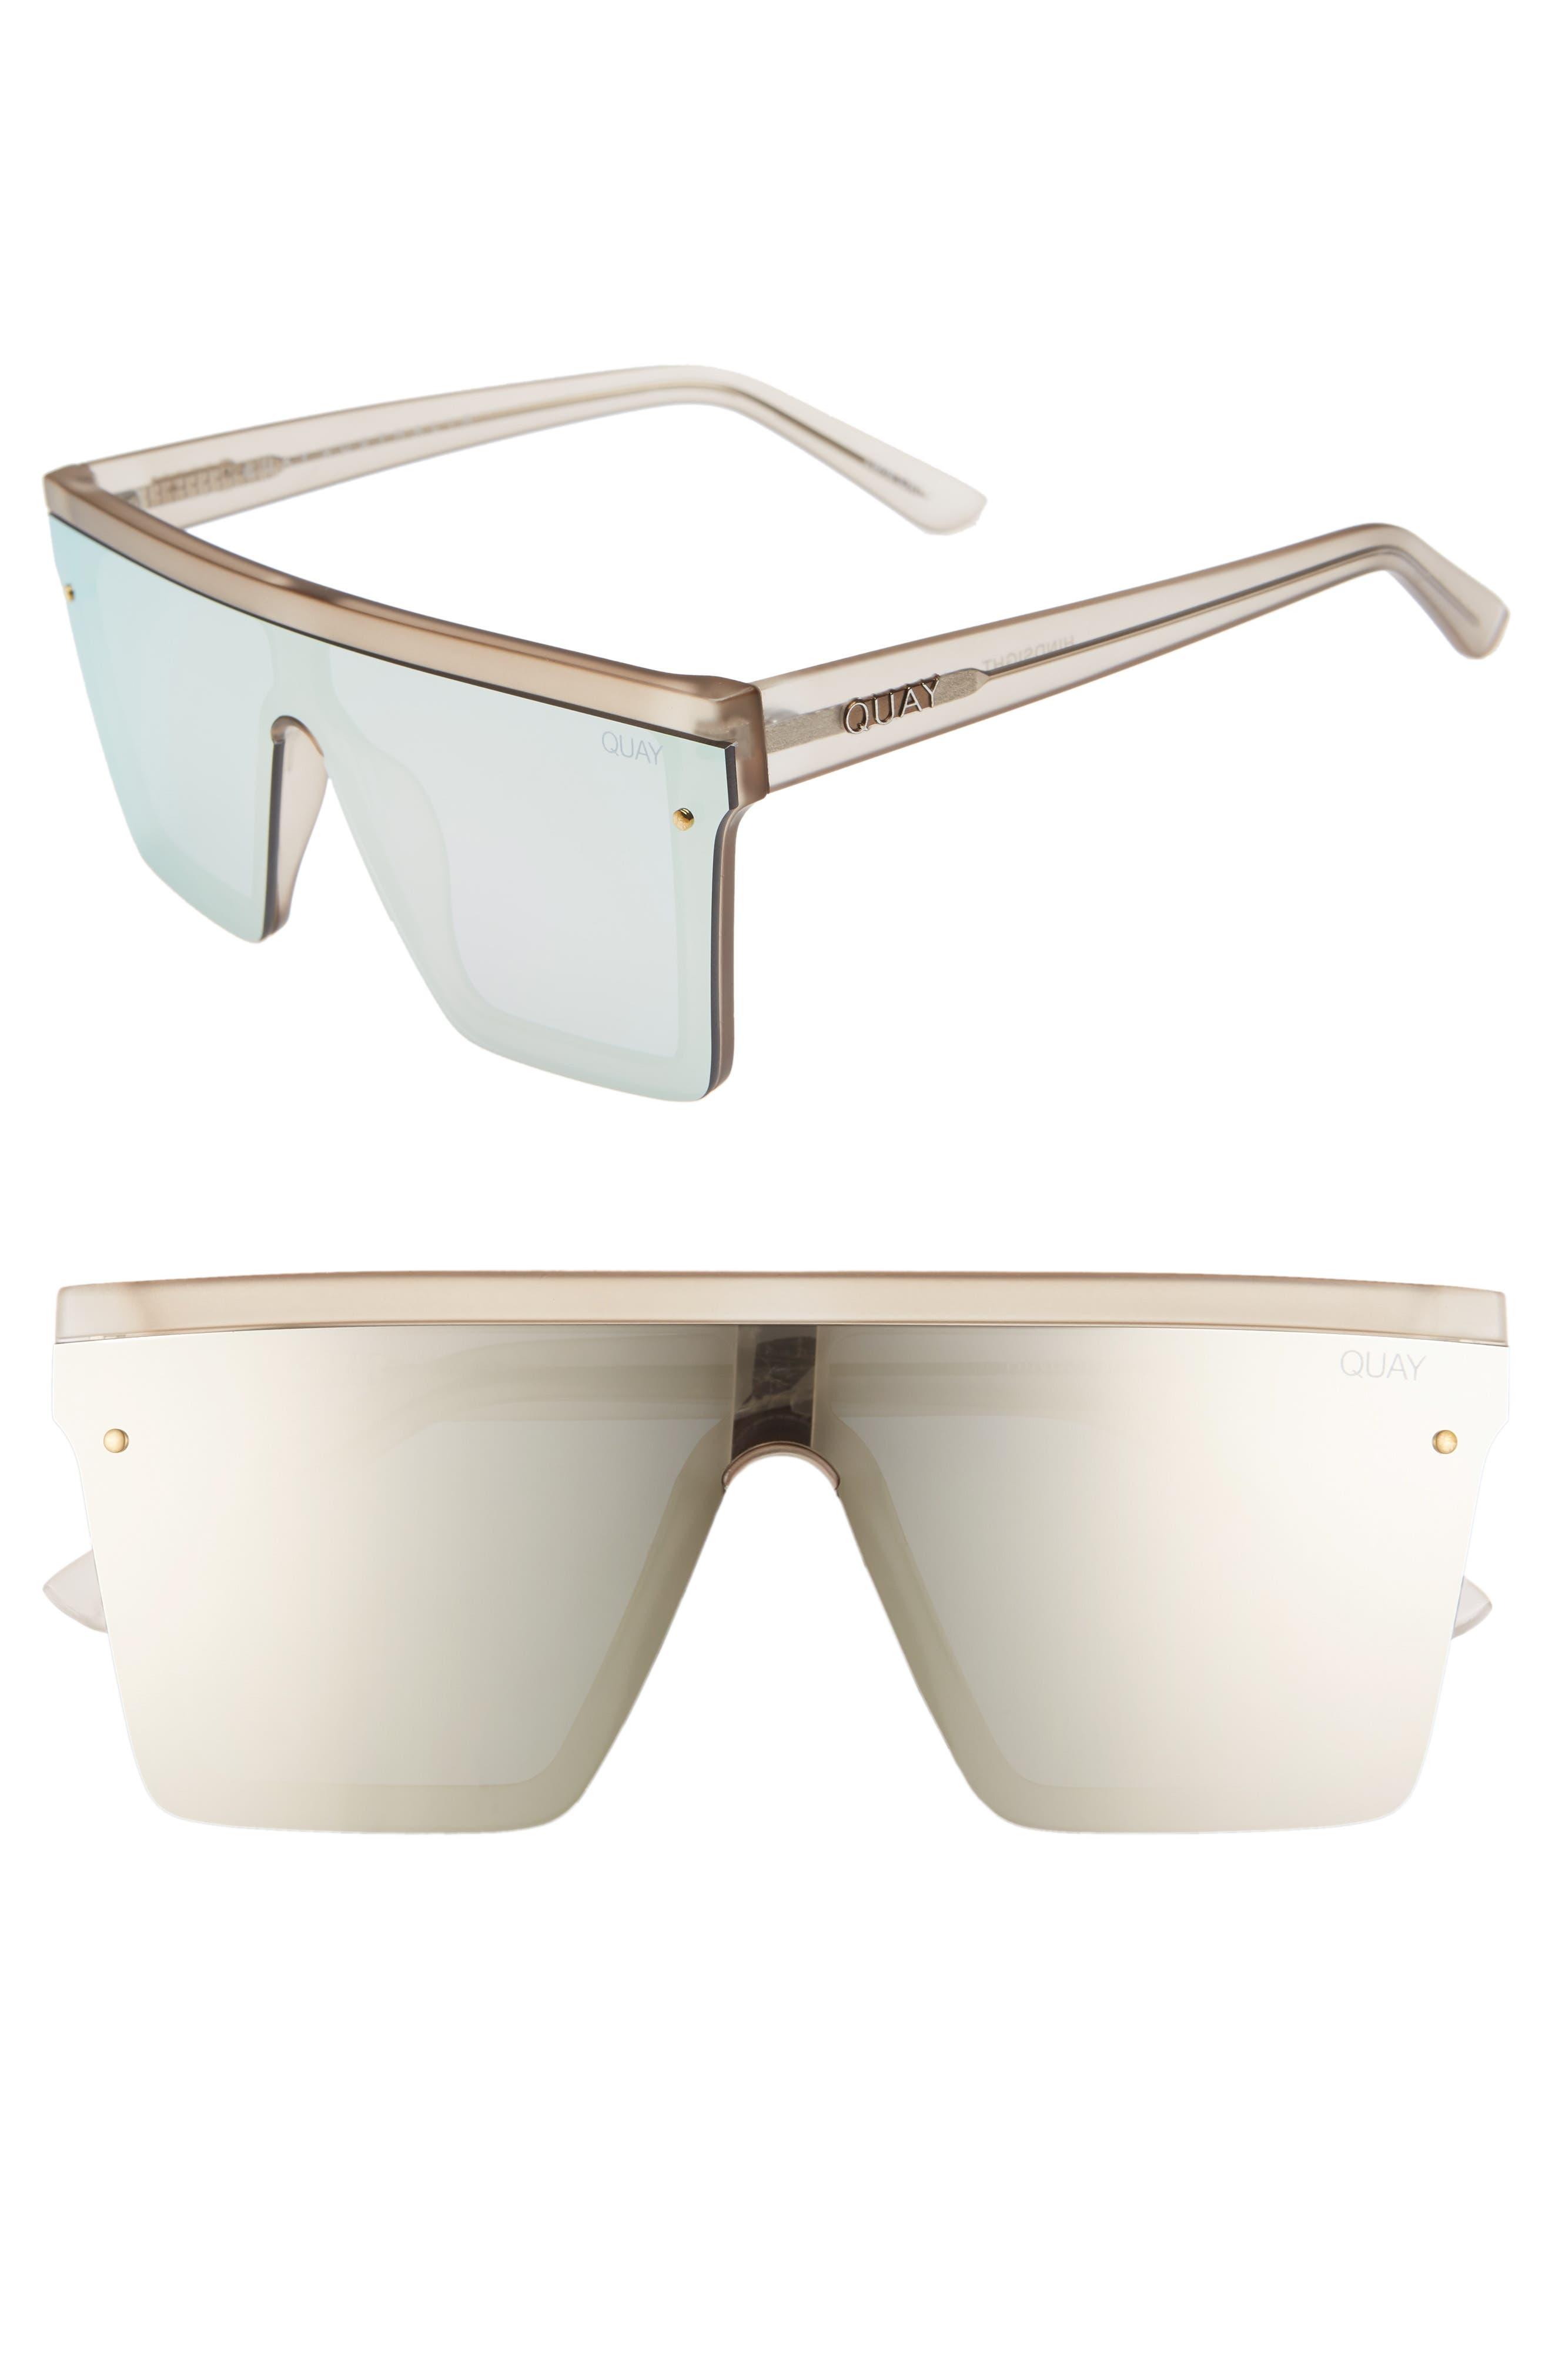 Hindsight 150mm Shield Sunglasses,                         Main,                         color, GOLD/ GOLD